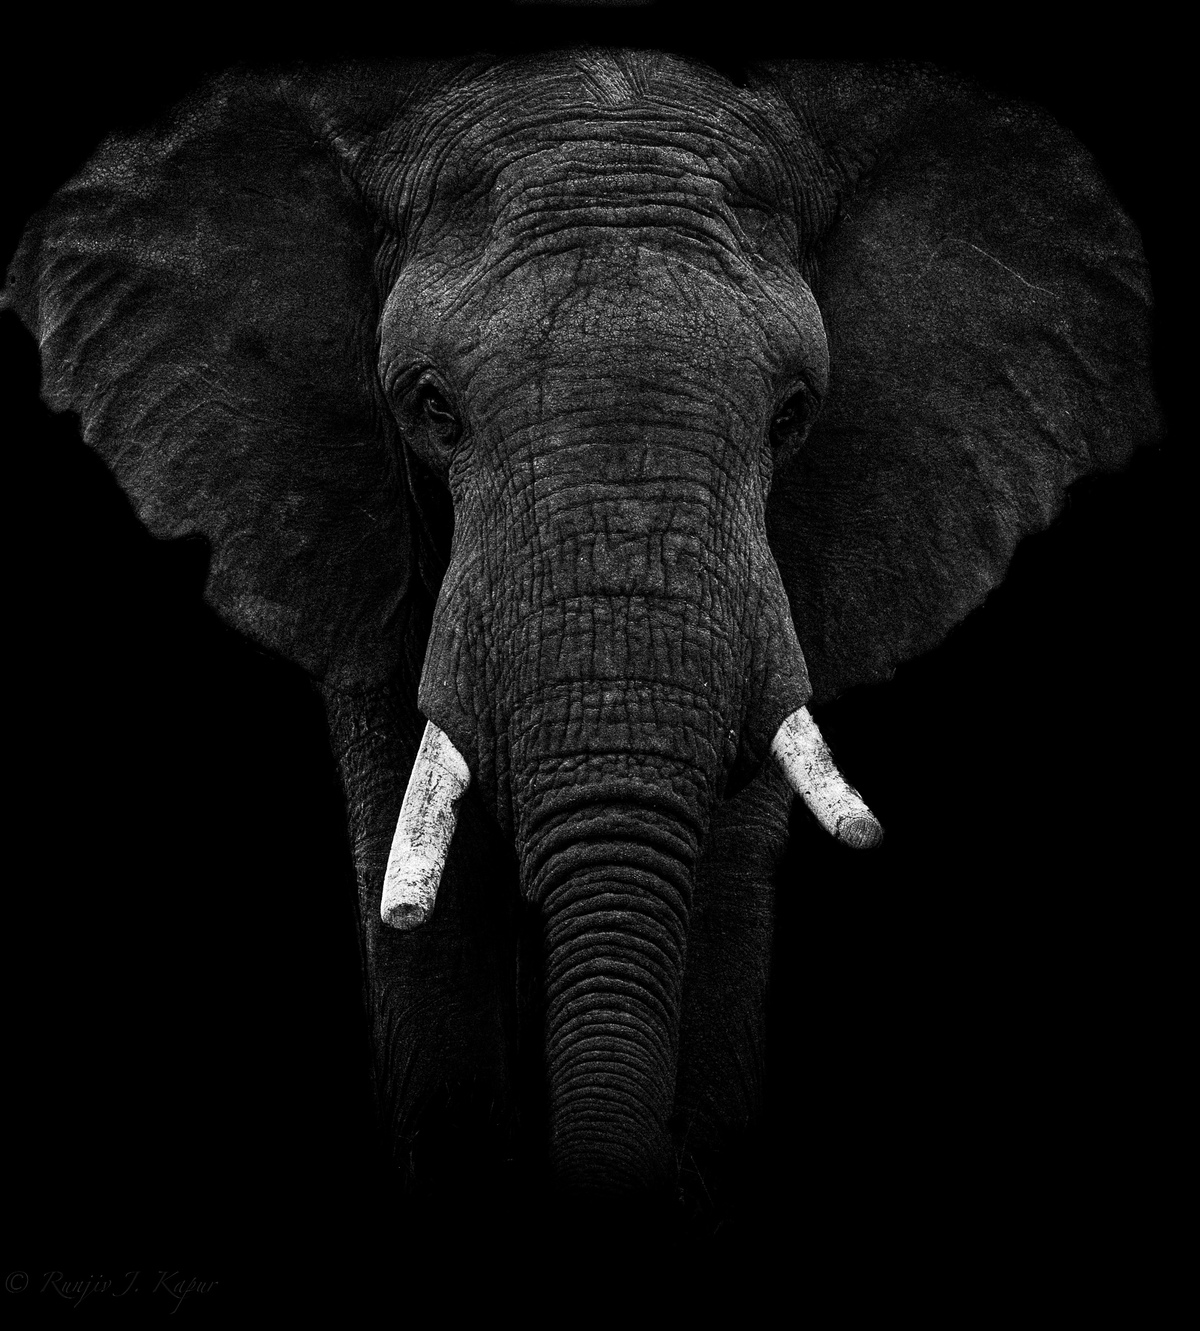 African Bull Elephant by Runjiv J. Kapur, Image Photography, Digital Print on Canvas, Black color